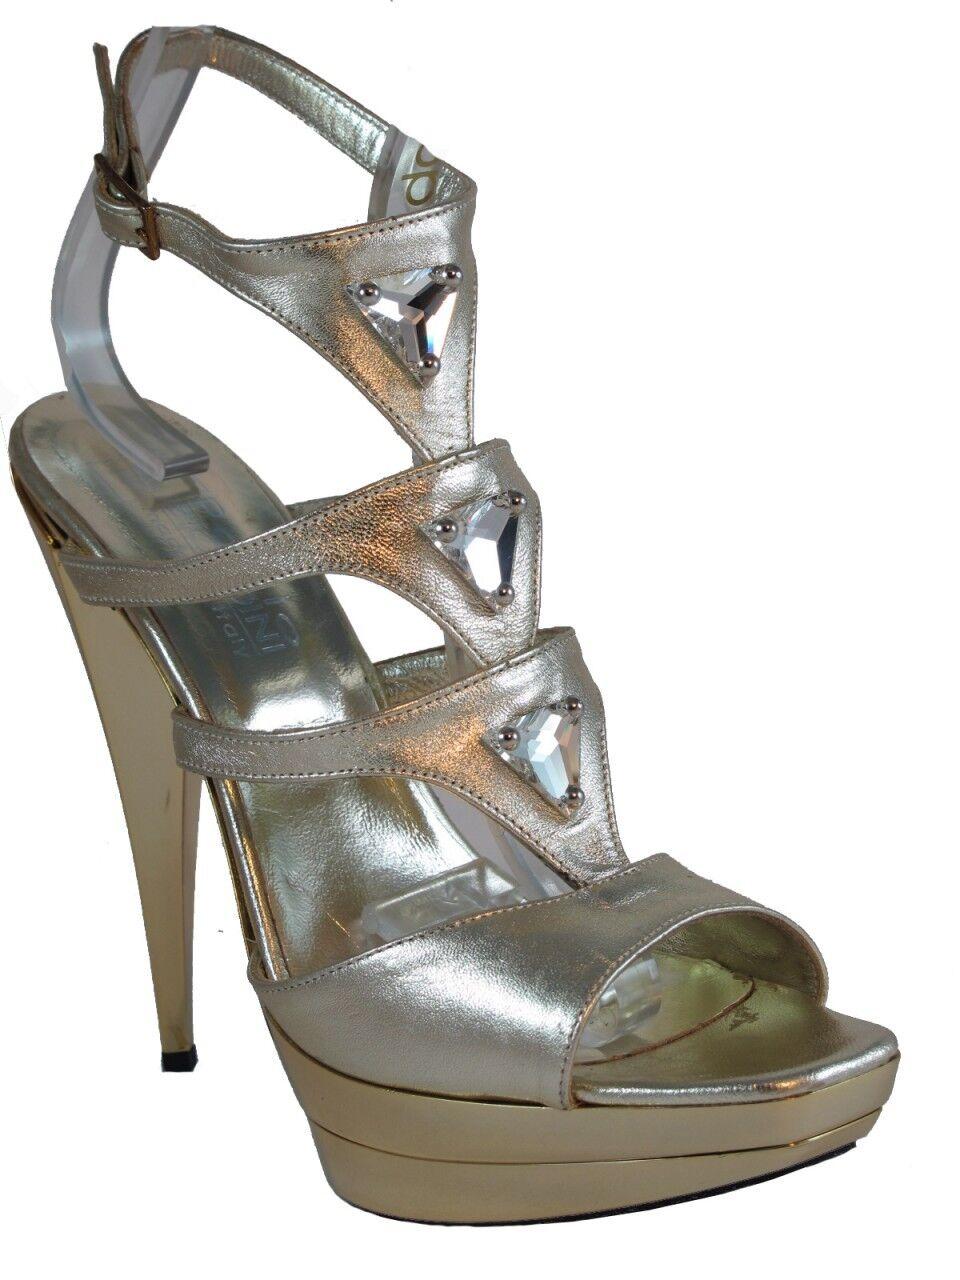 Women's Biondini 5.5 5.5 5.5  High Heel Dressy Leather Sandal gold 7453 92eff5